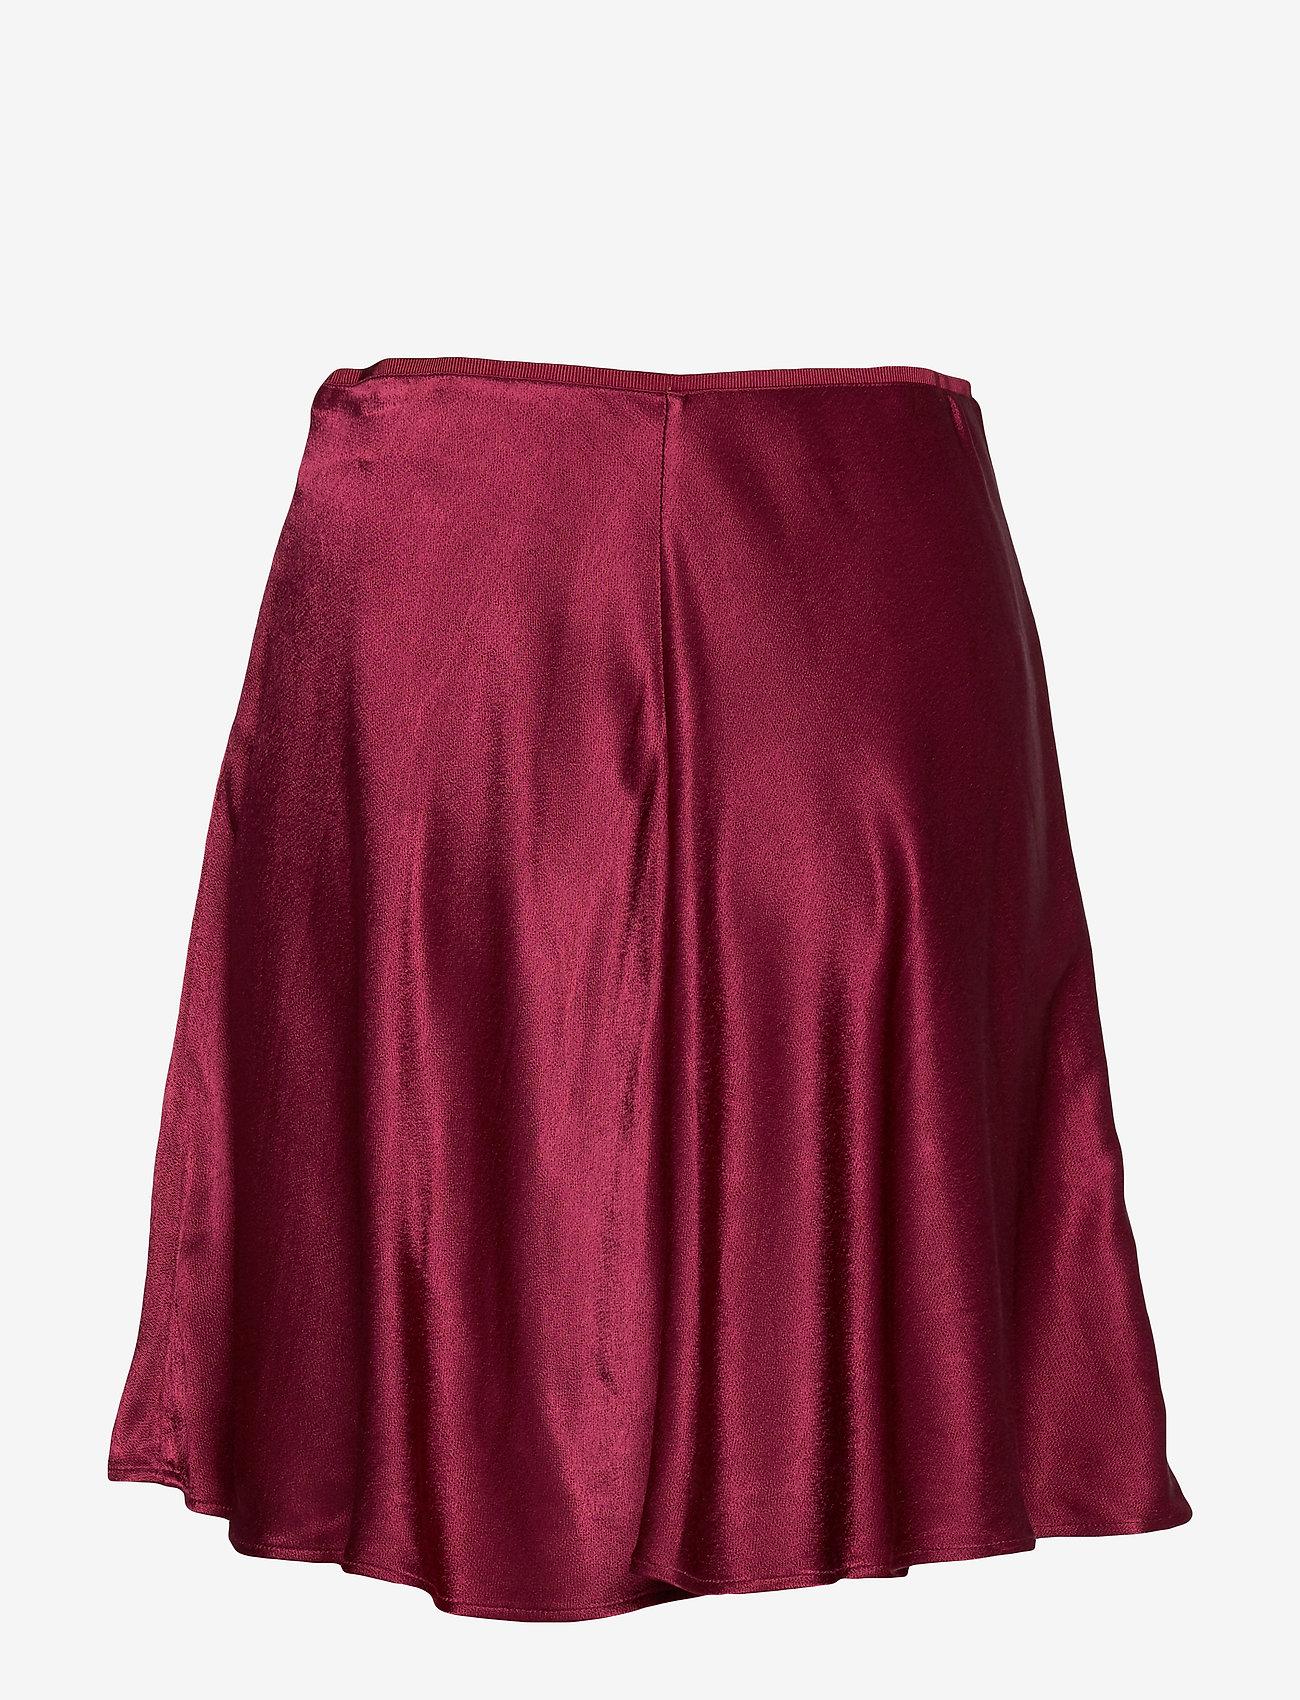 Samsøe Samsøe Alsop short skirt 10447 - Spódnice RHODODENDRON - Kobiety Odzież.